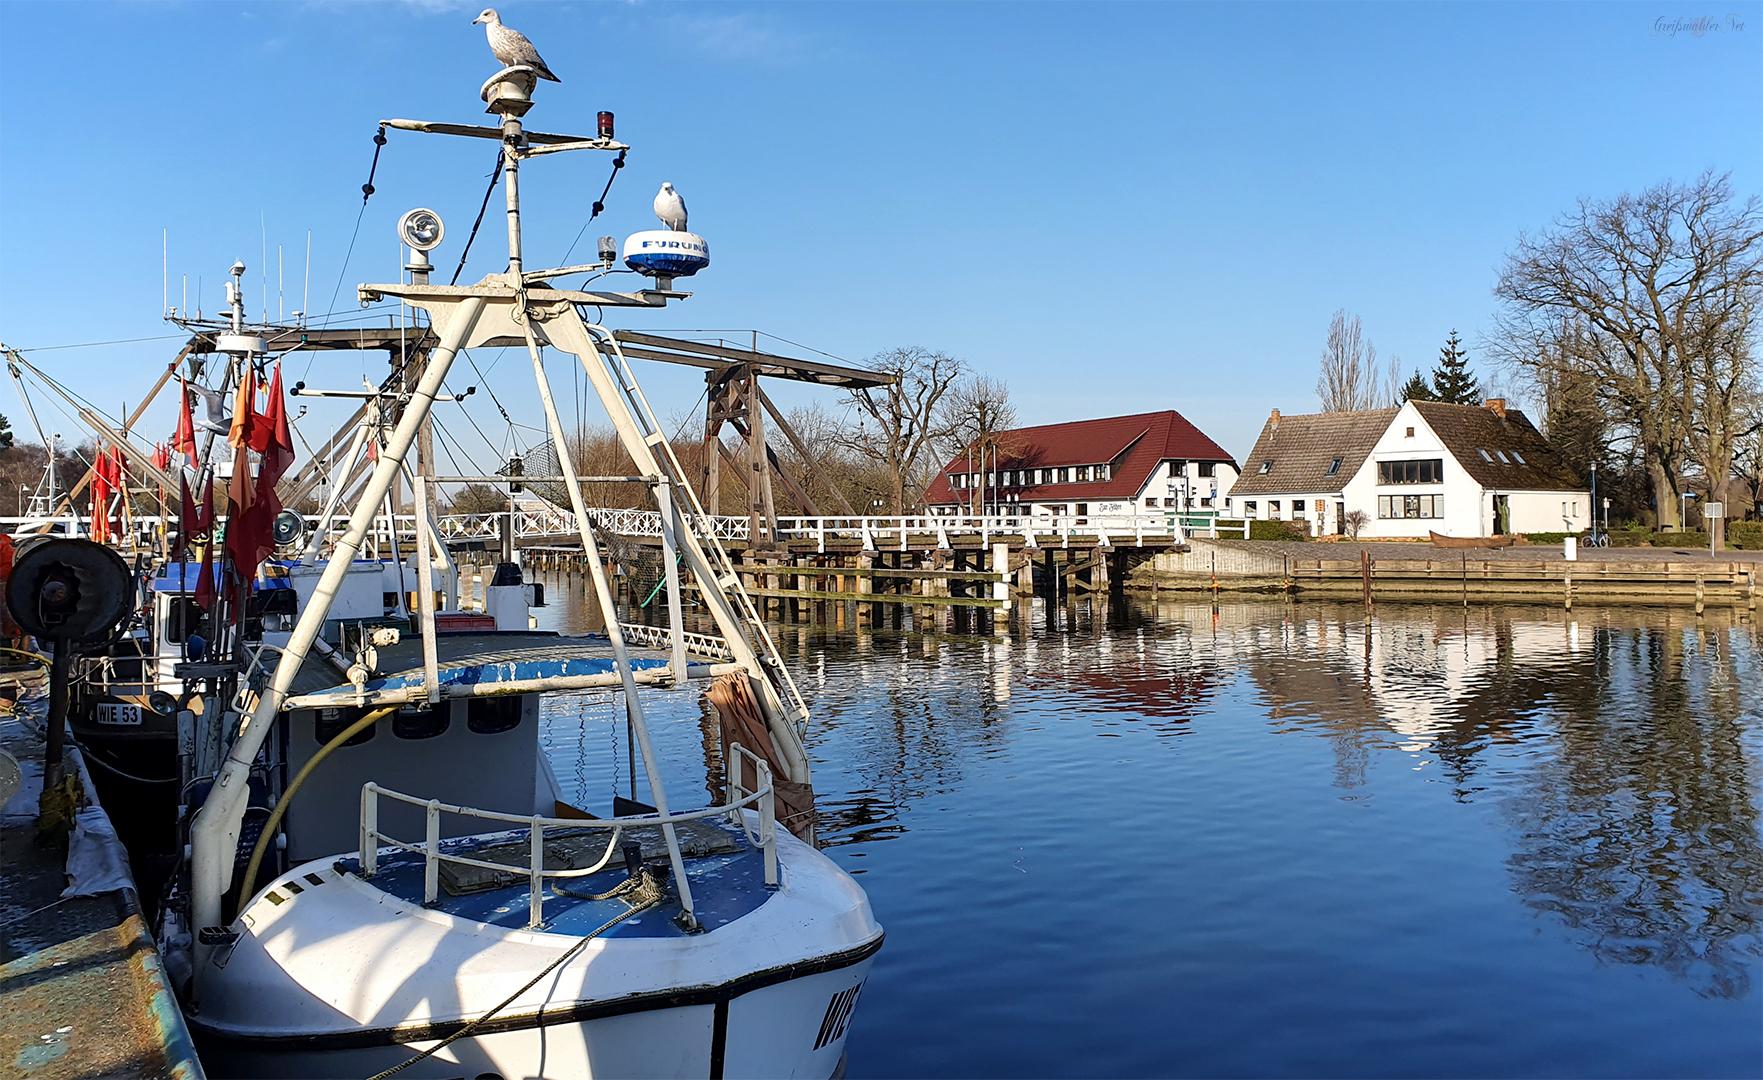 Sonniger Tag in Greifswald-Wieck